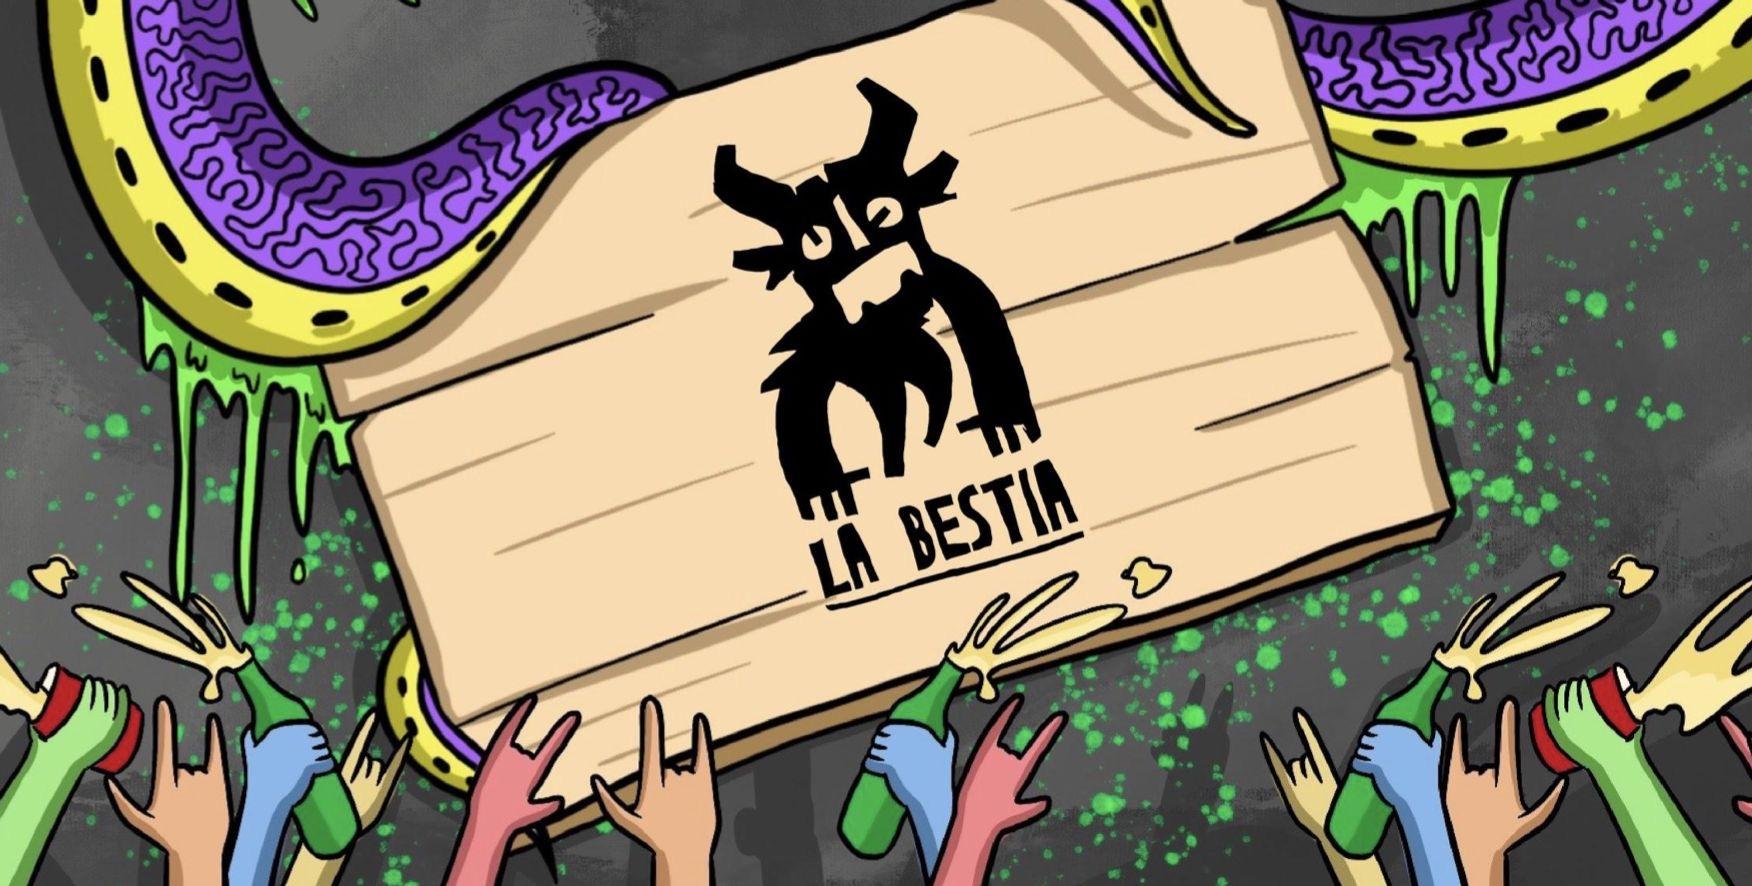 la-bestia-new-bands-on-the-block